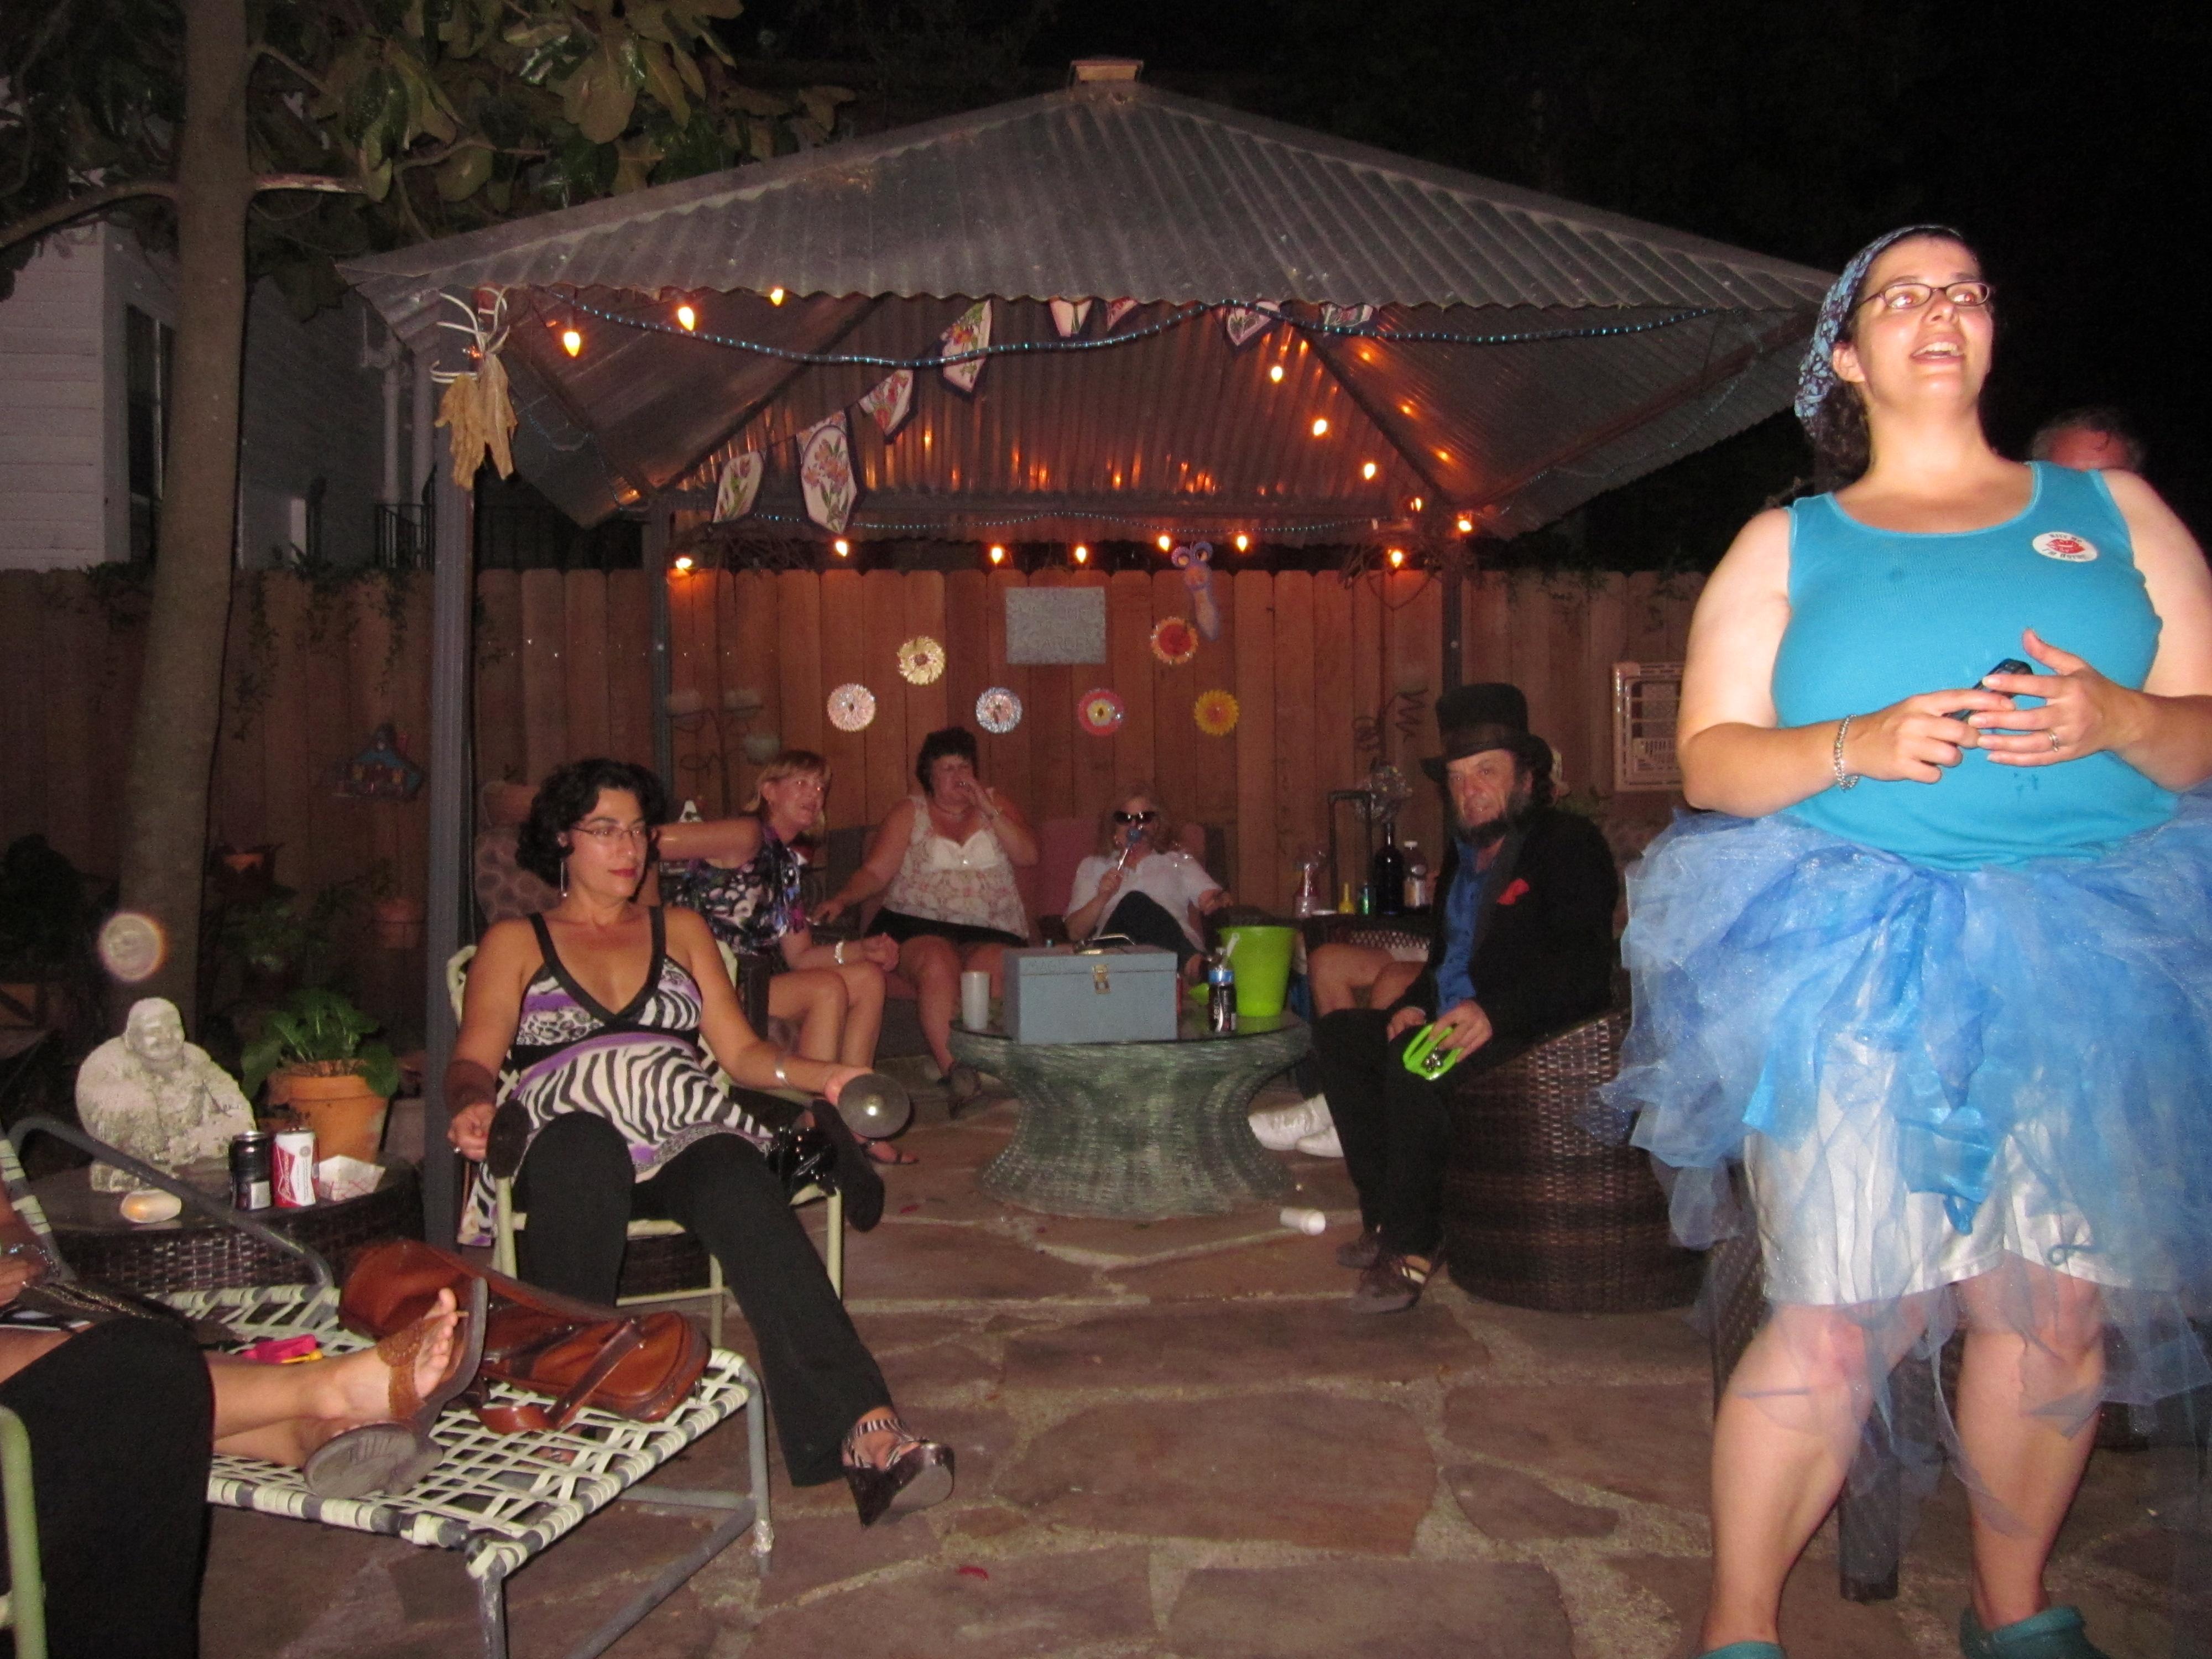 file carrollton party back yard wikimedia commons